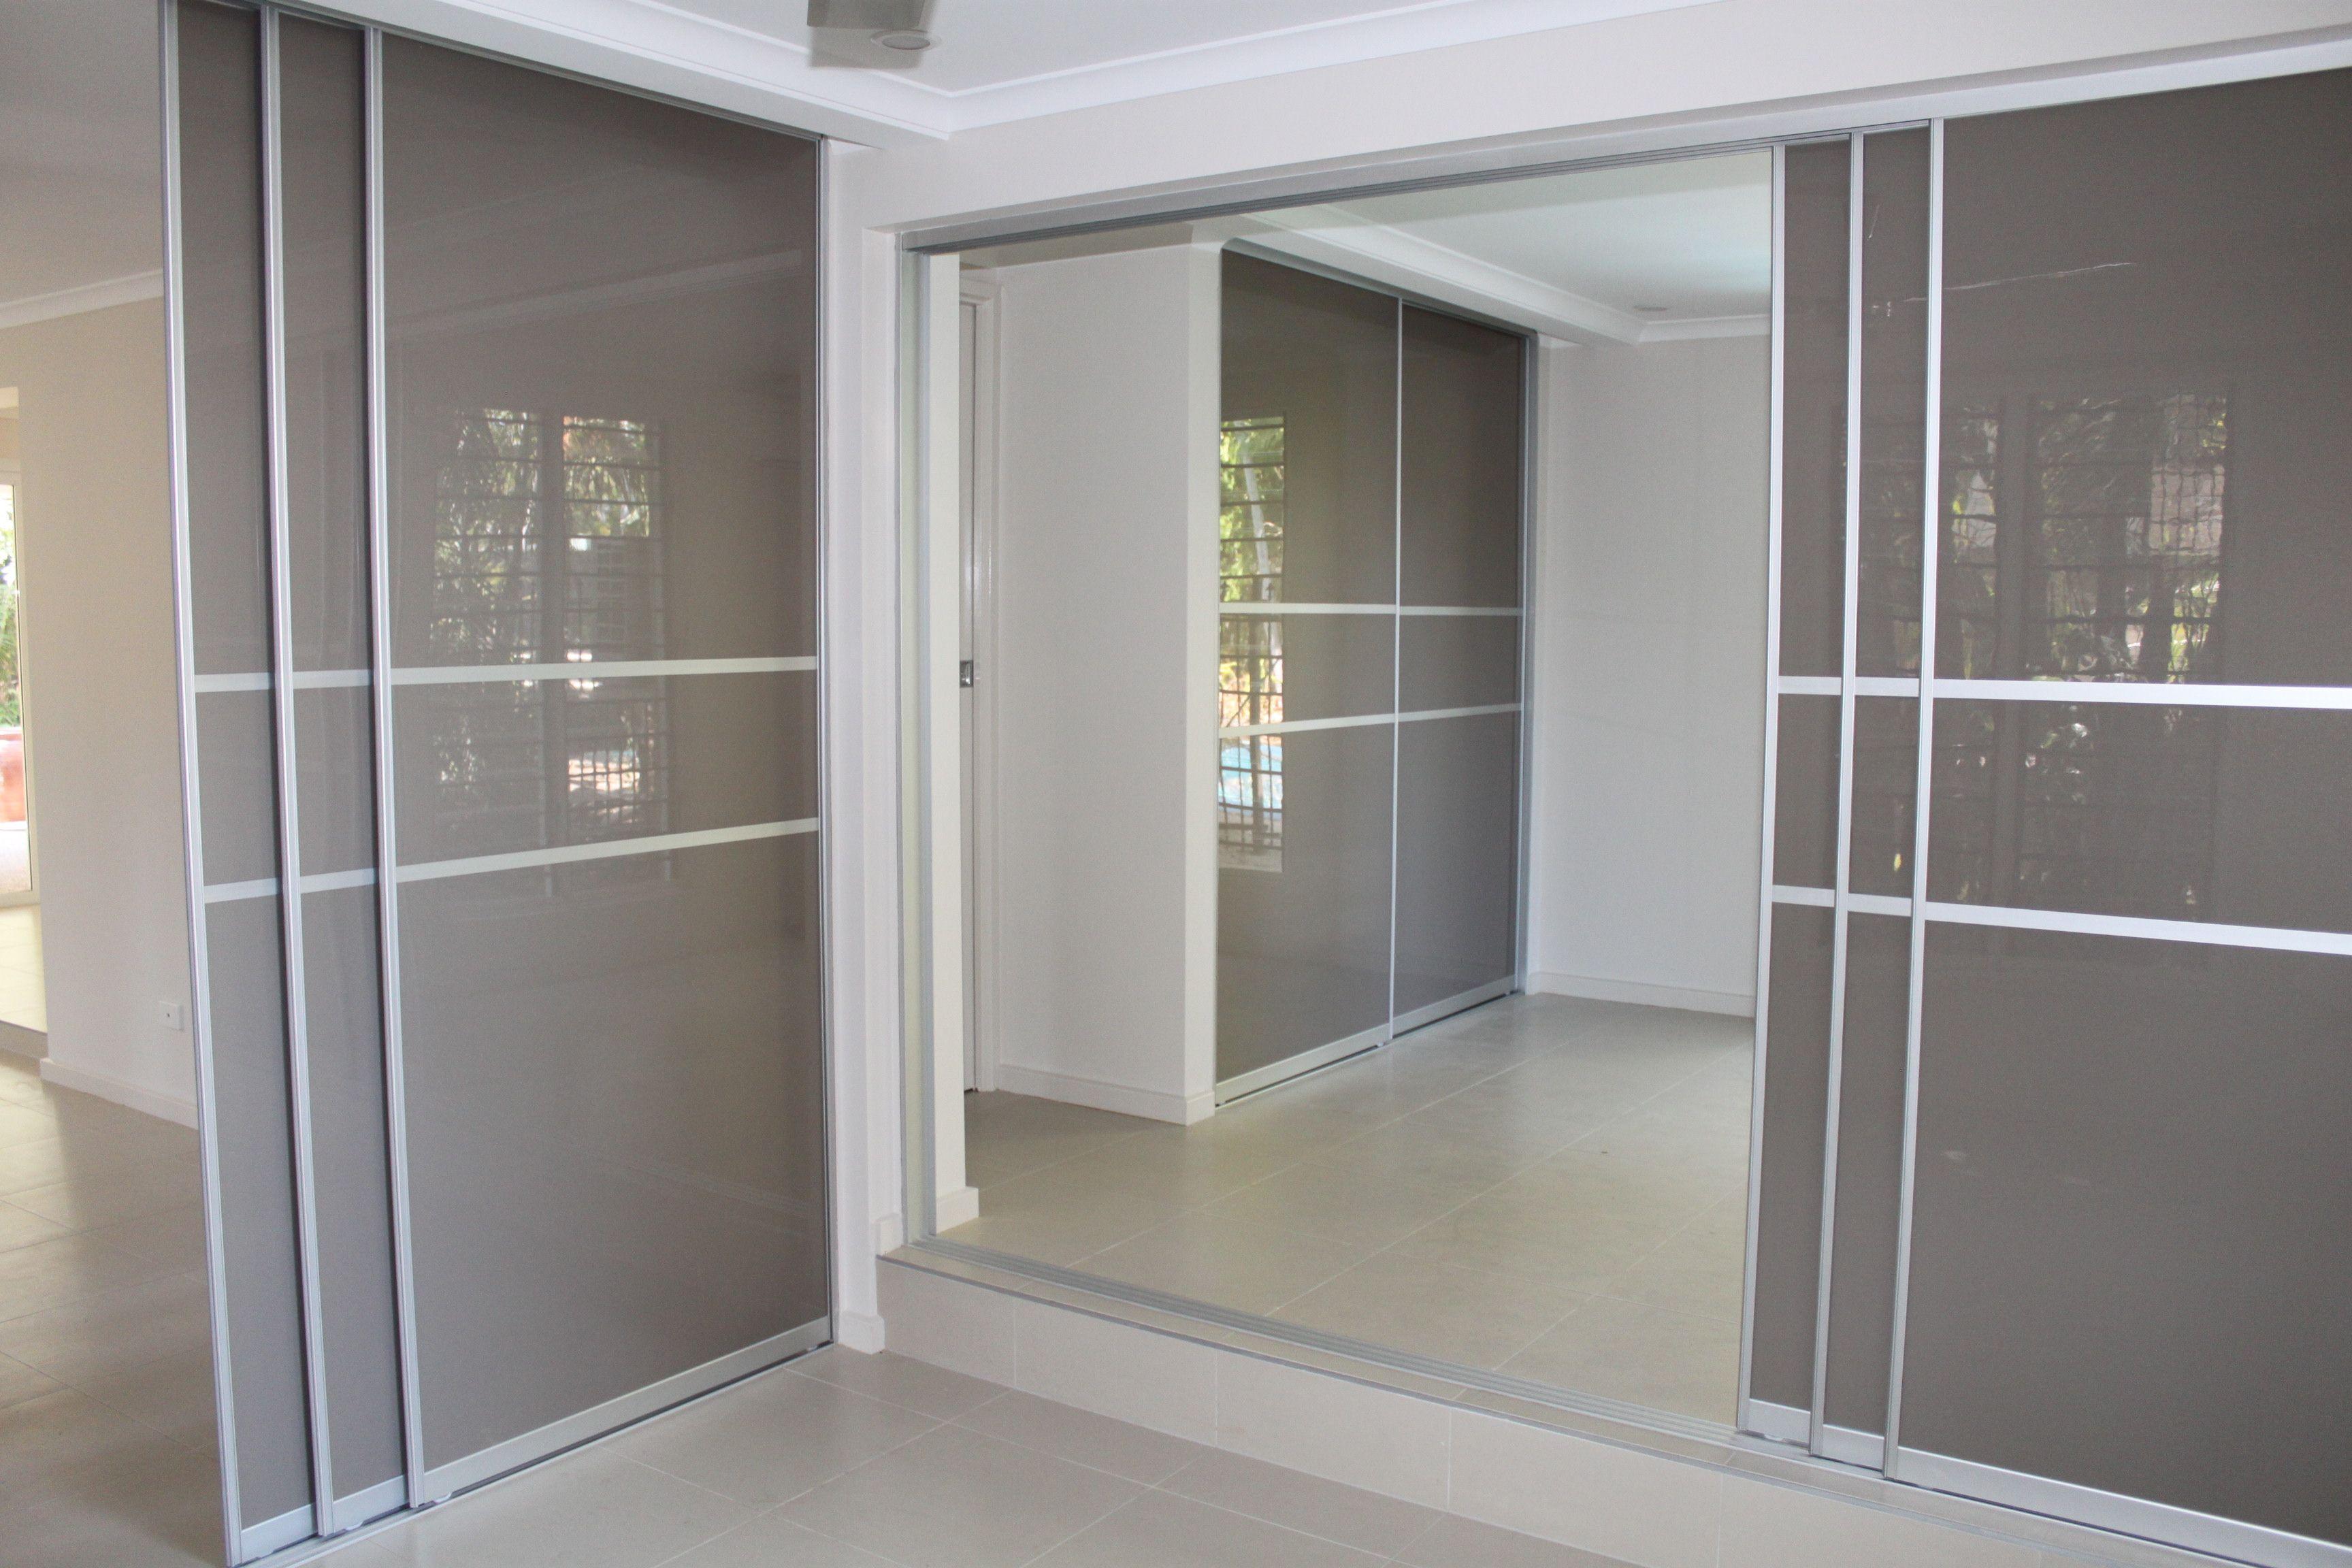 floor kit full divider extraordinary room wall barn size sliding doors to seat dividers amazon ceiling